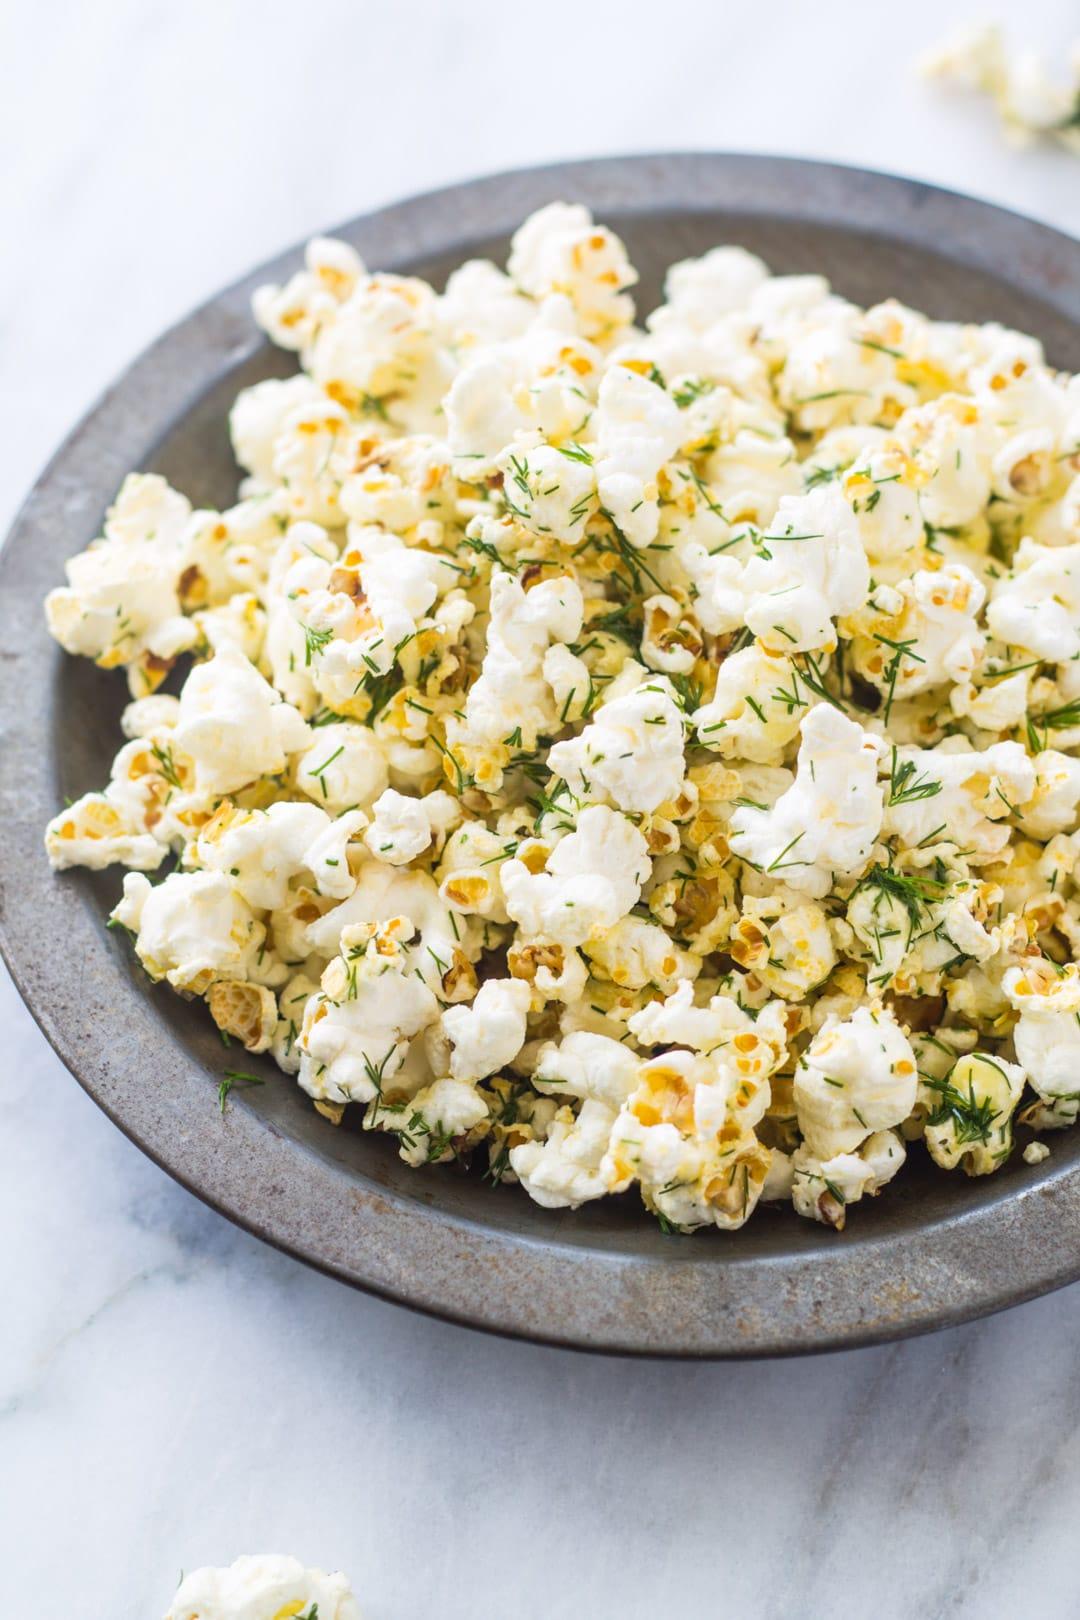 fodmap diet and popcorn